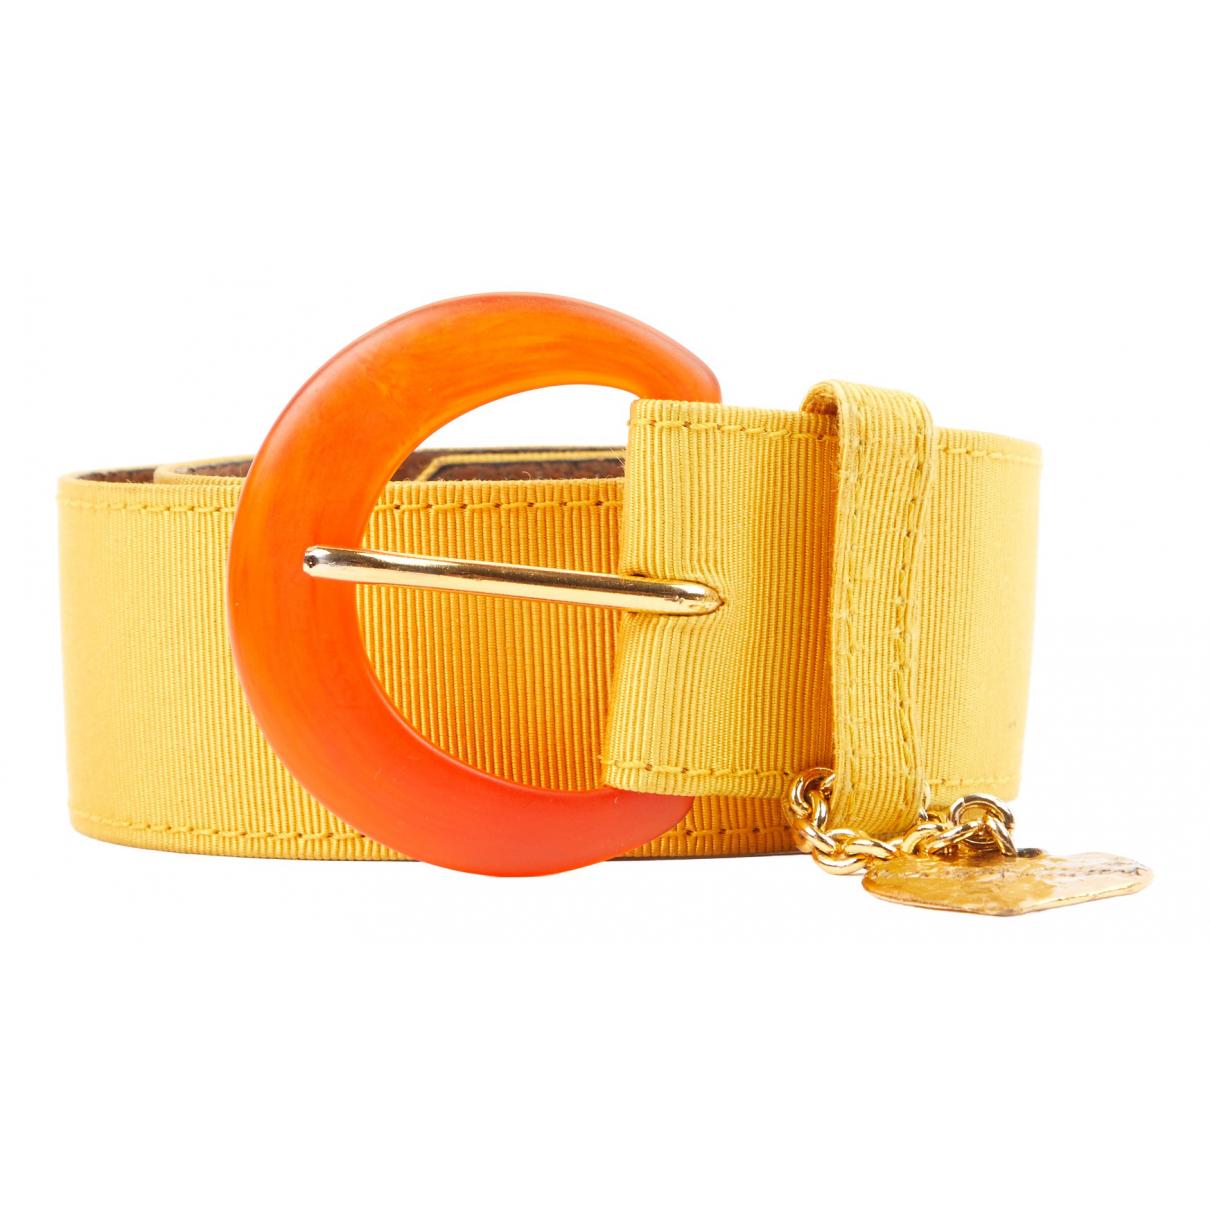 Yves Saint Laurent N Yellow Cloth belt for Women 75 cm